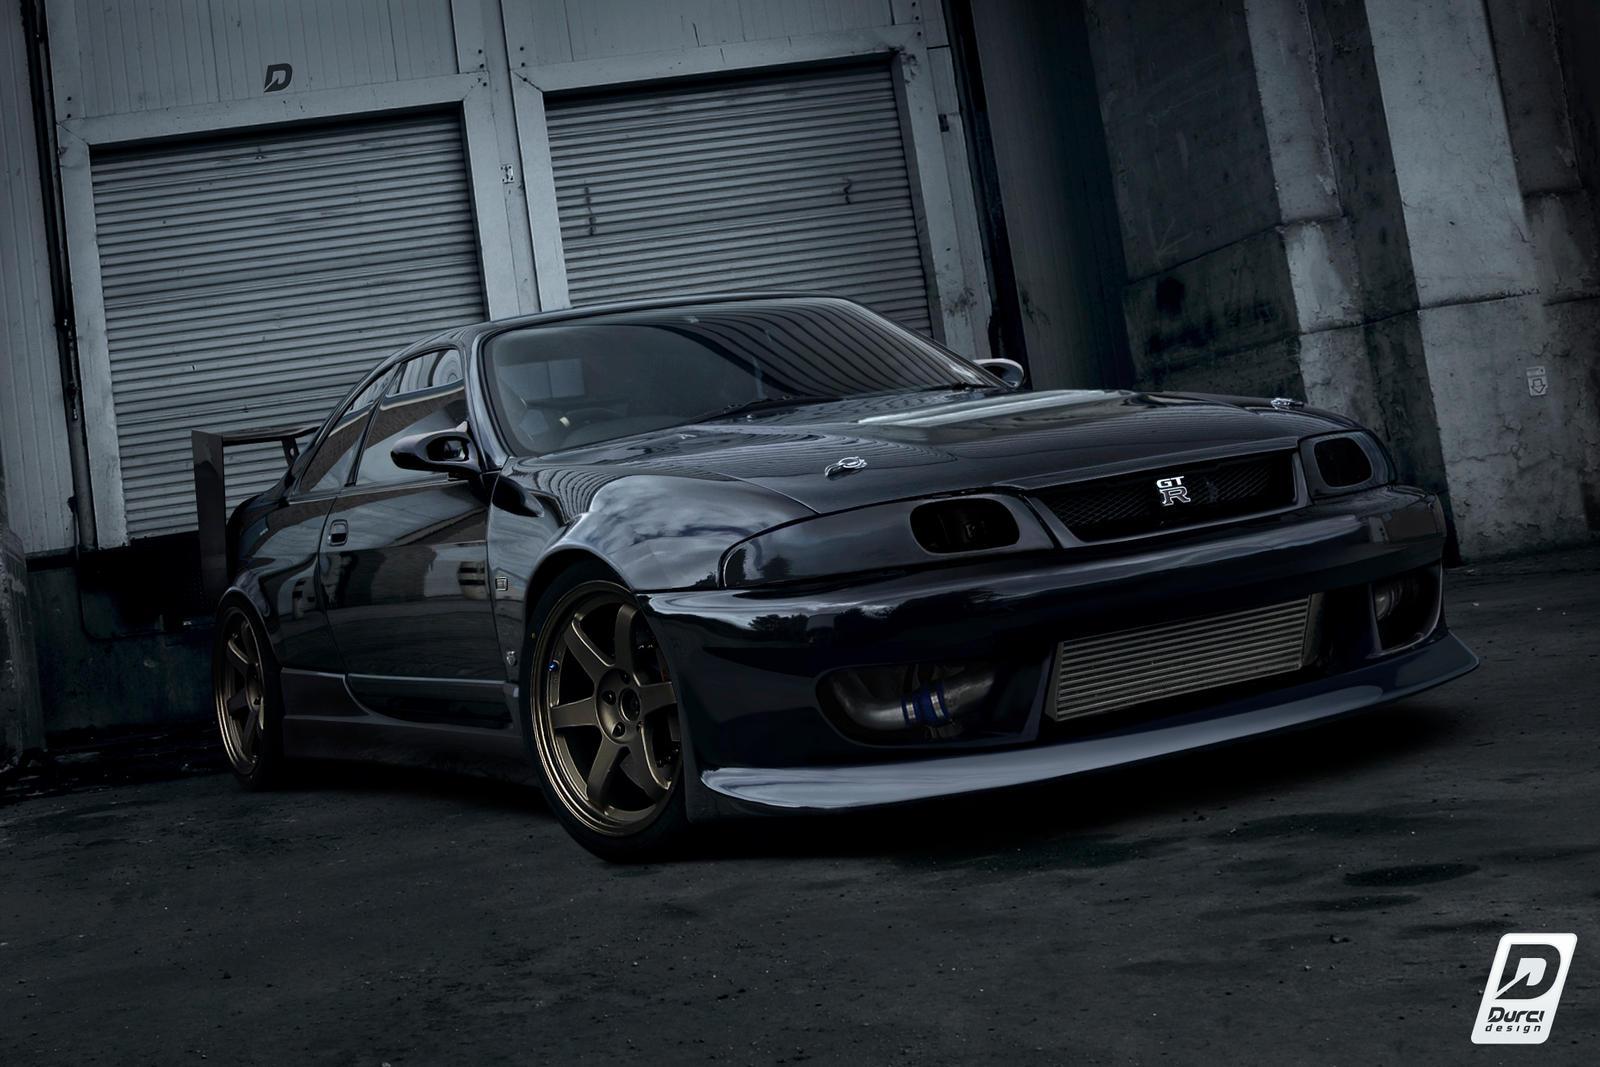 Nissan Skyline R33 drift spec